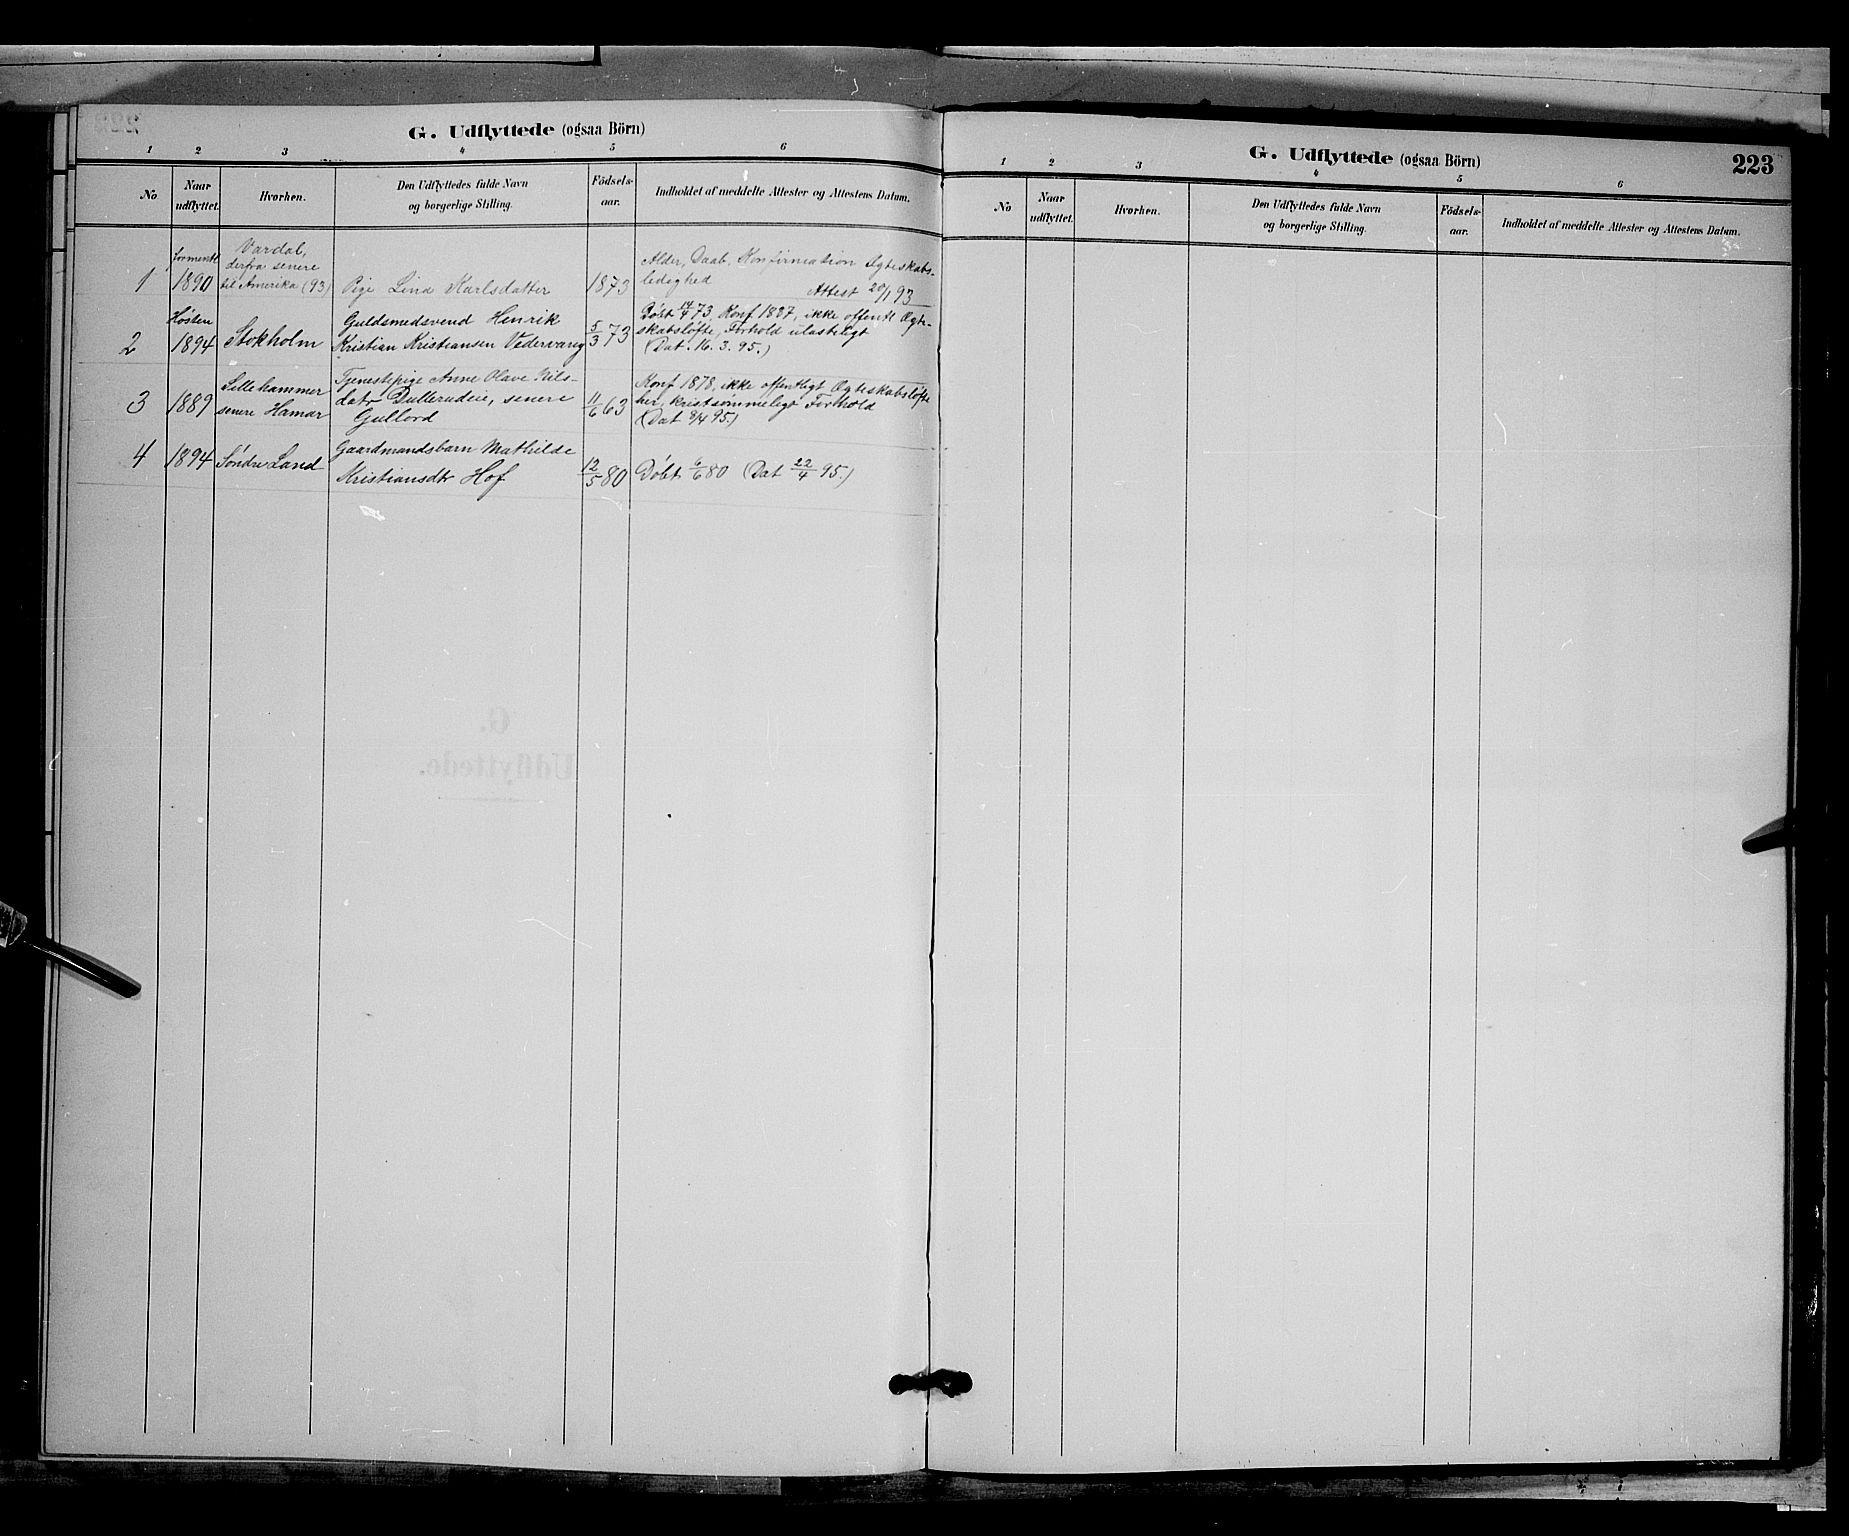 SAH, Biri prestekontor, Klokkerbok nr. 3, 1892-1905, s. 223